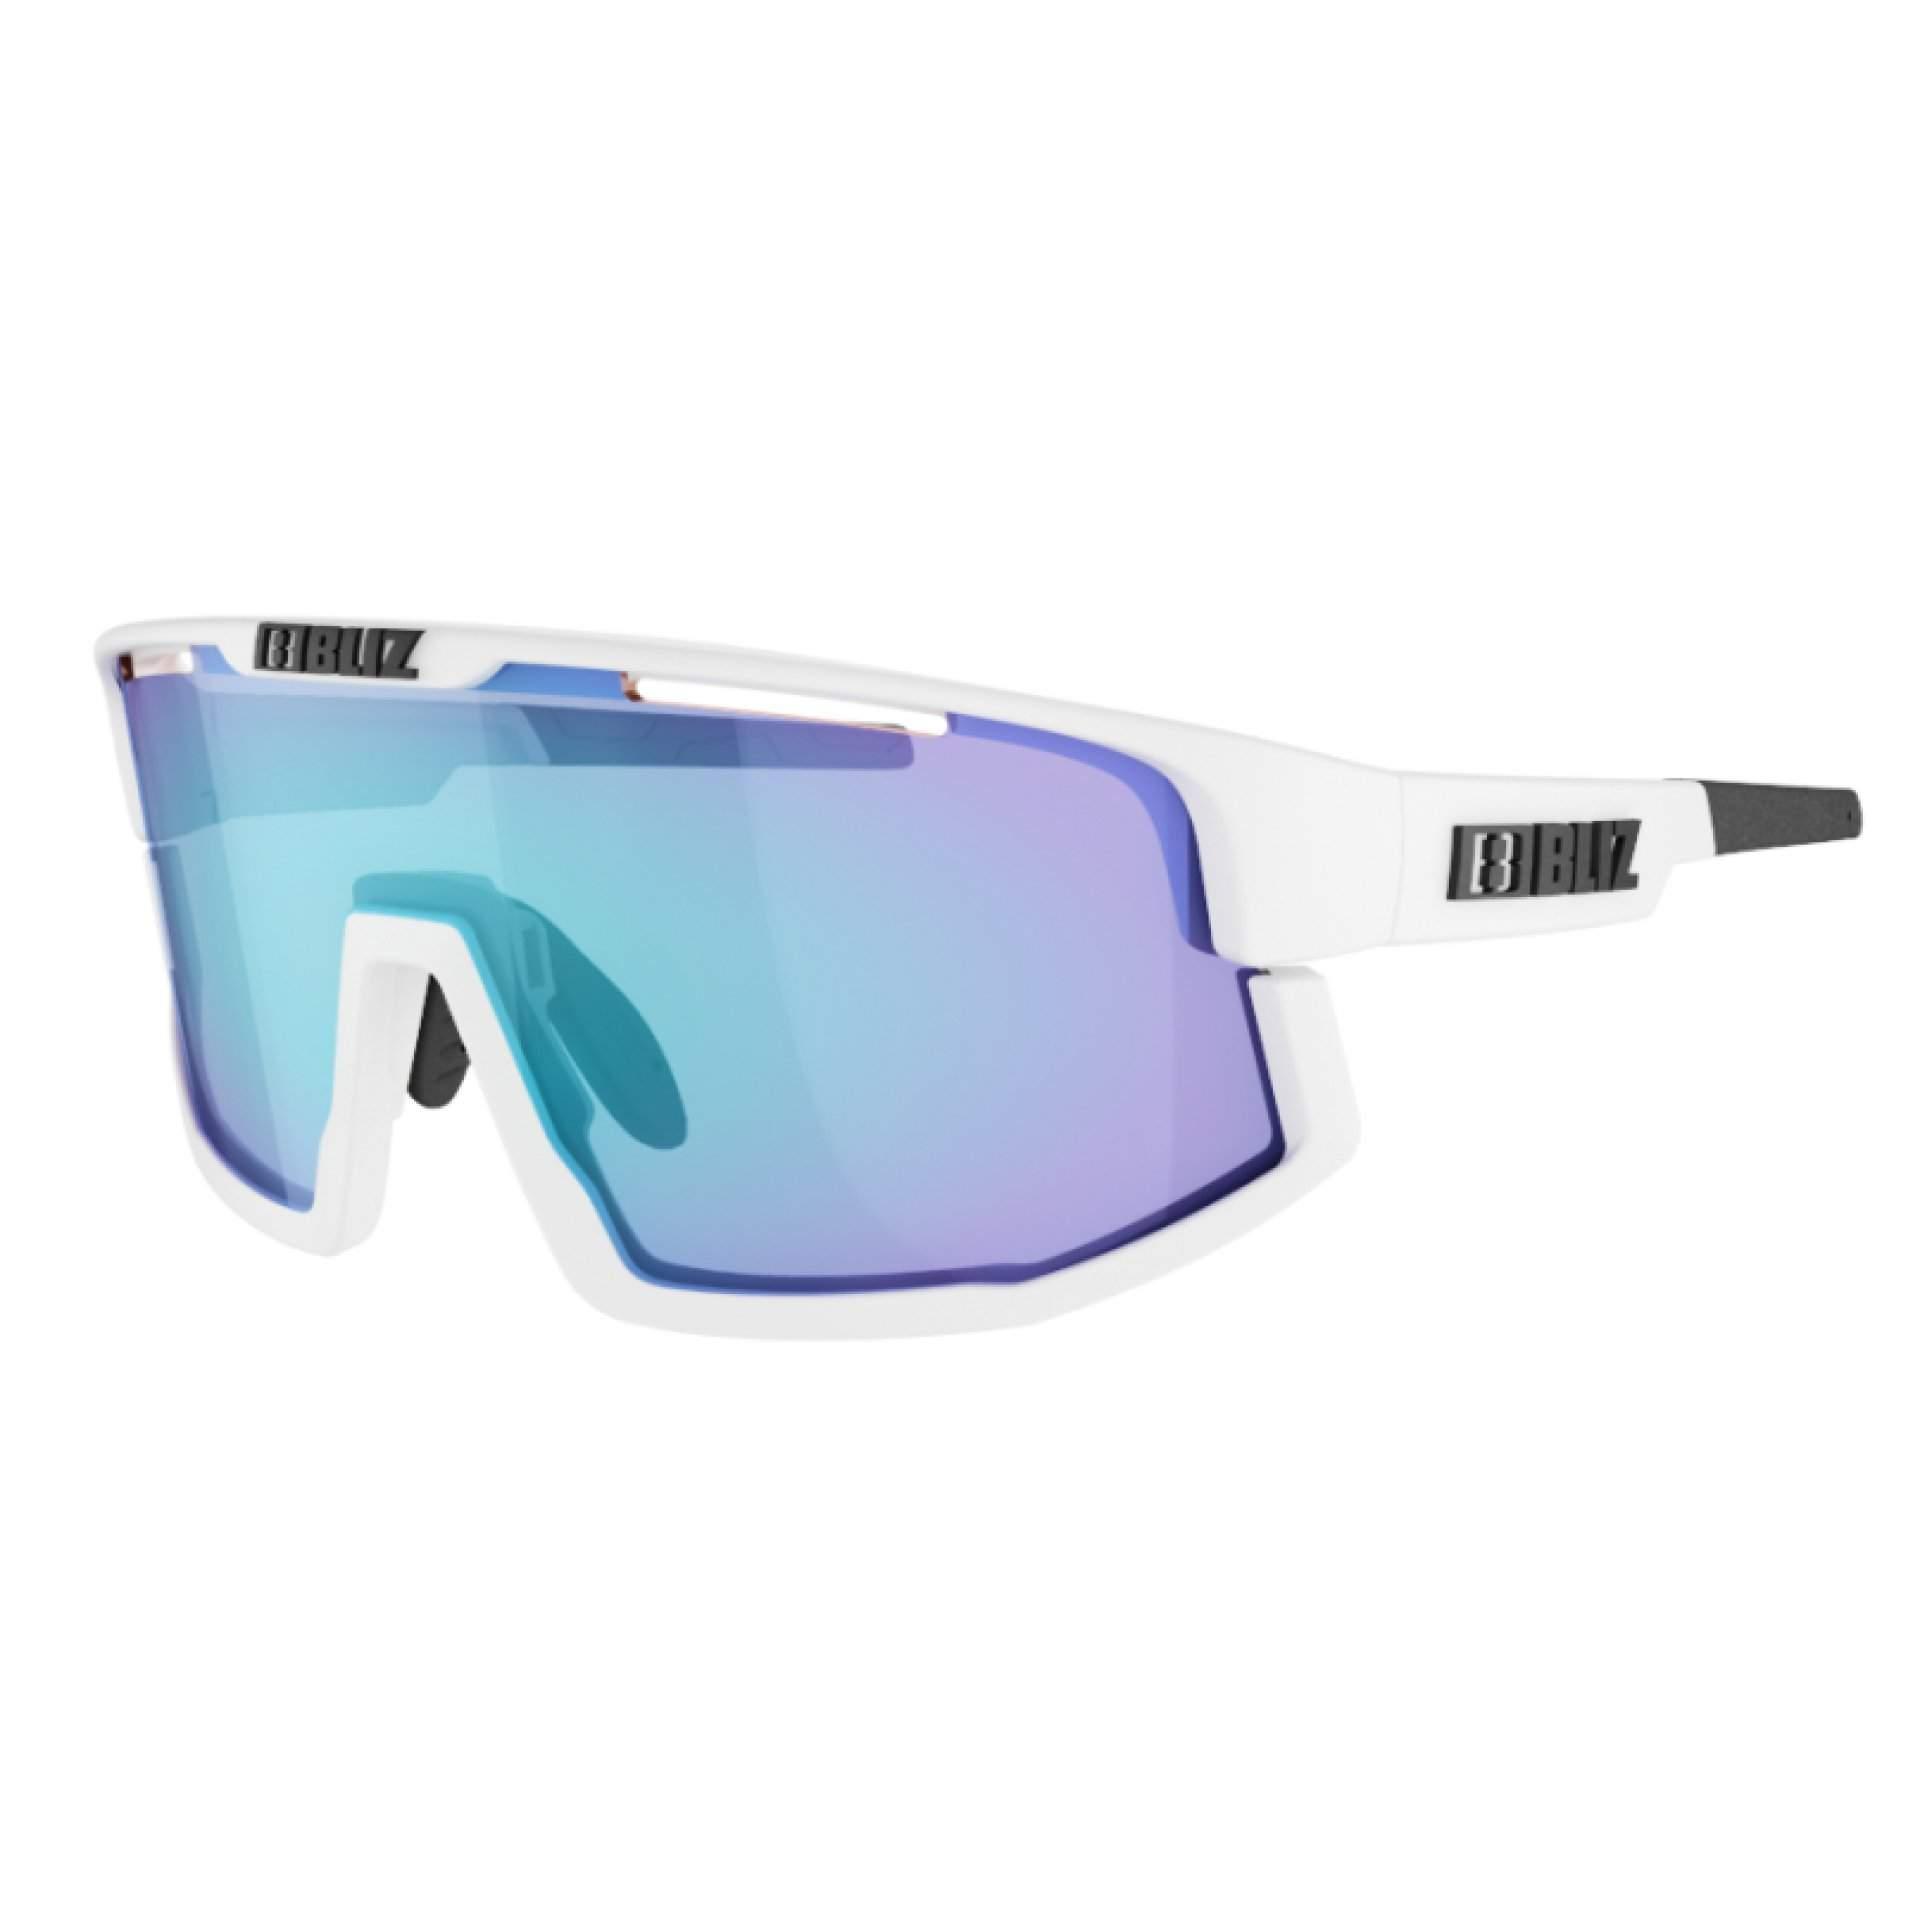 OKULARY BLIZ VISION WHITE SMOKE W BLUE MULTI 52001 03